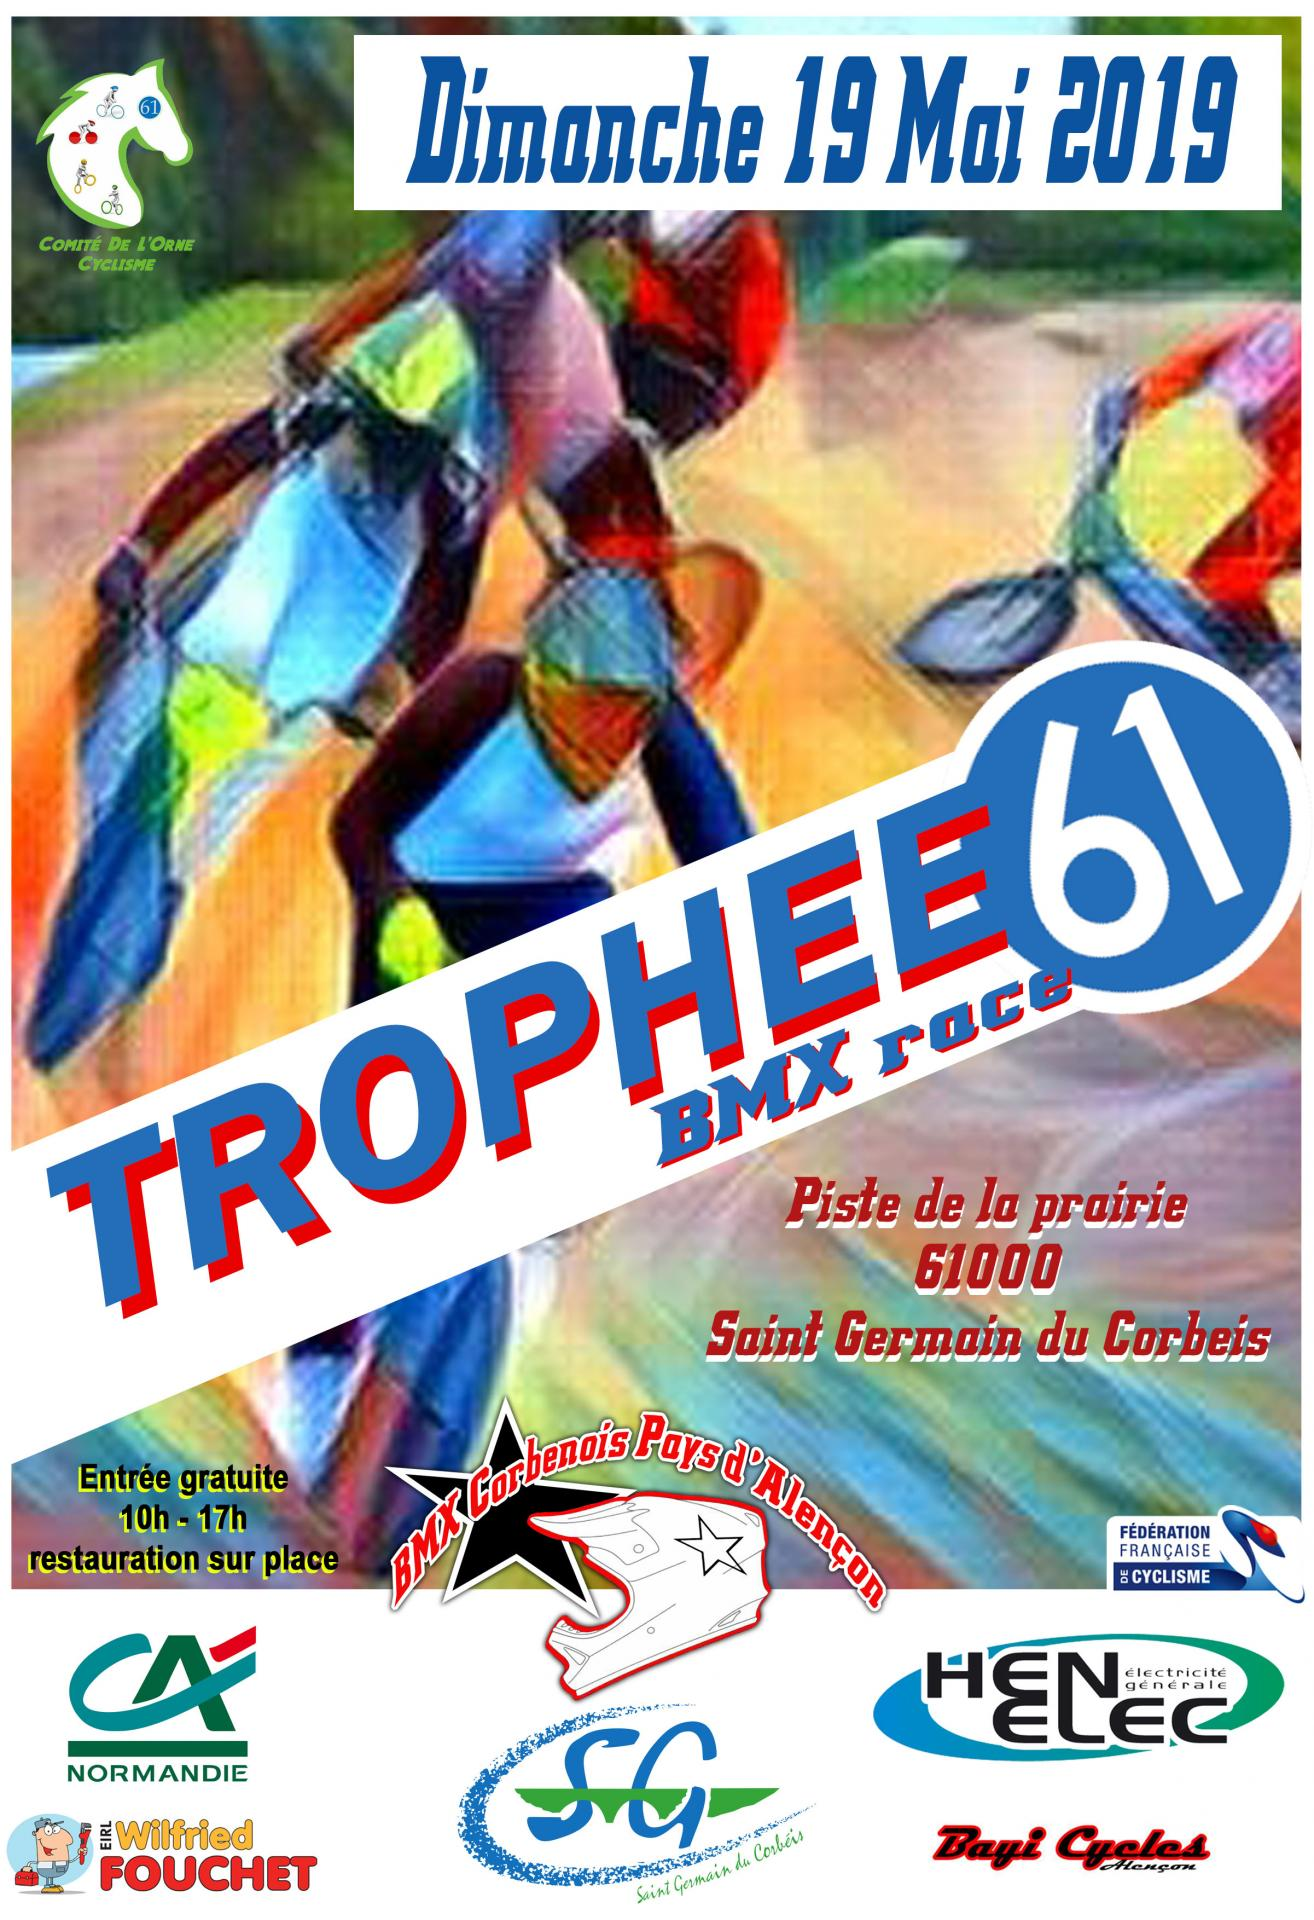 Trophee61 19